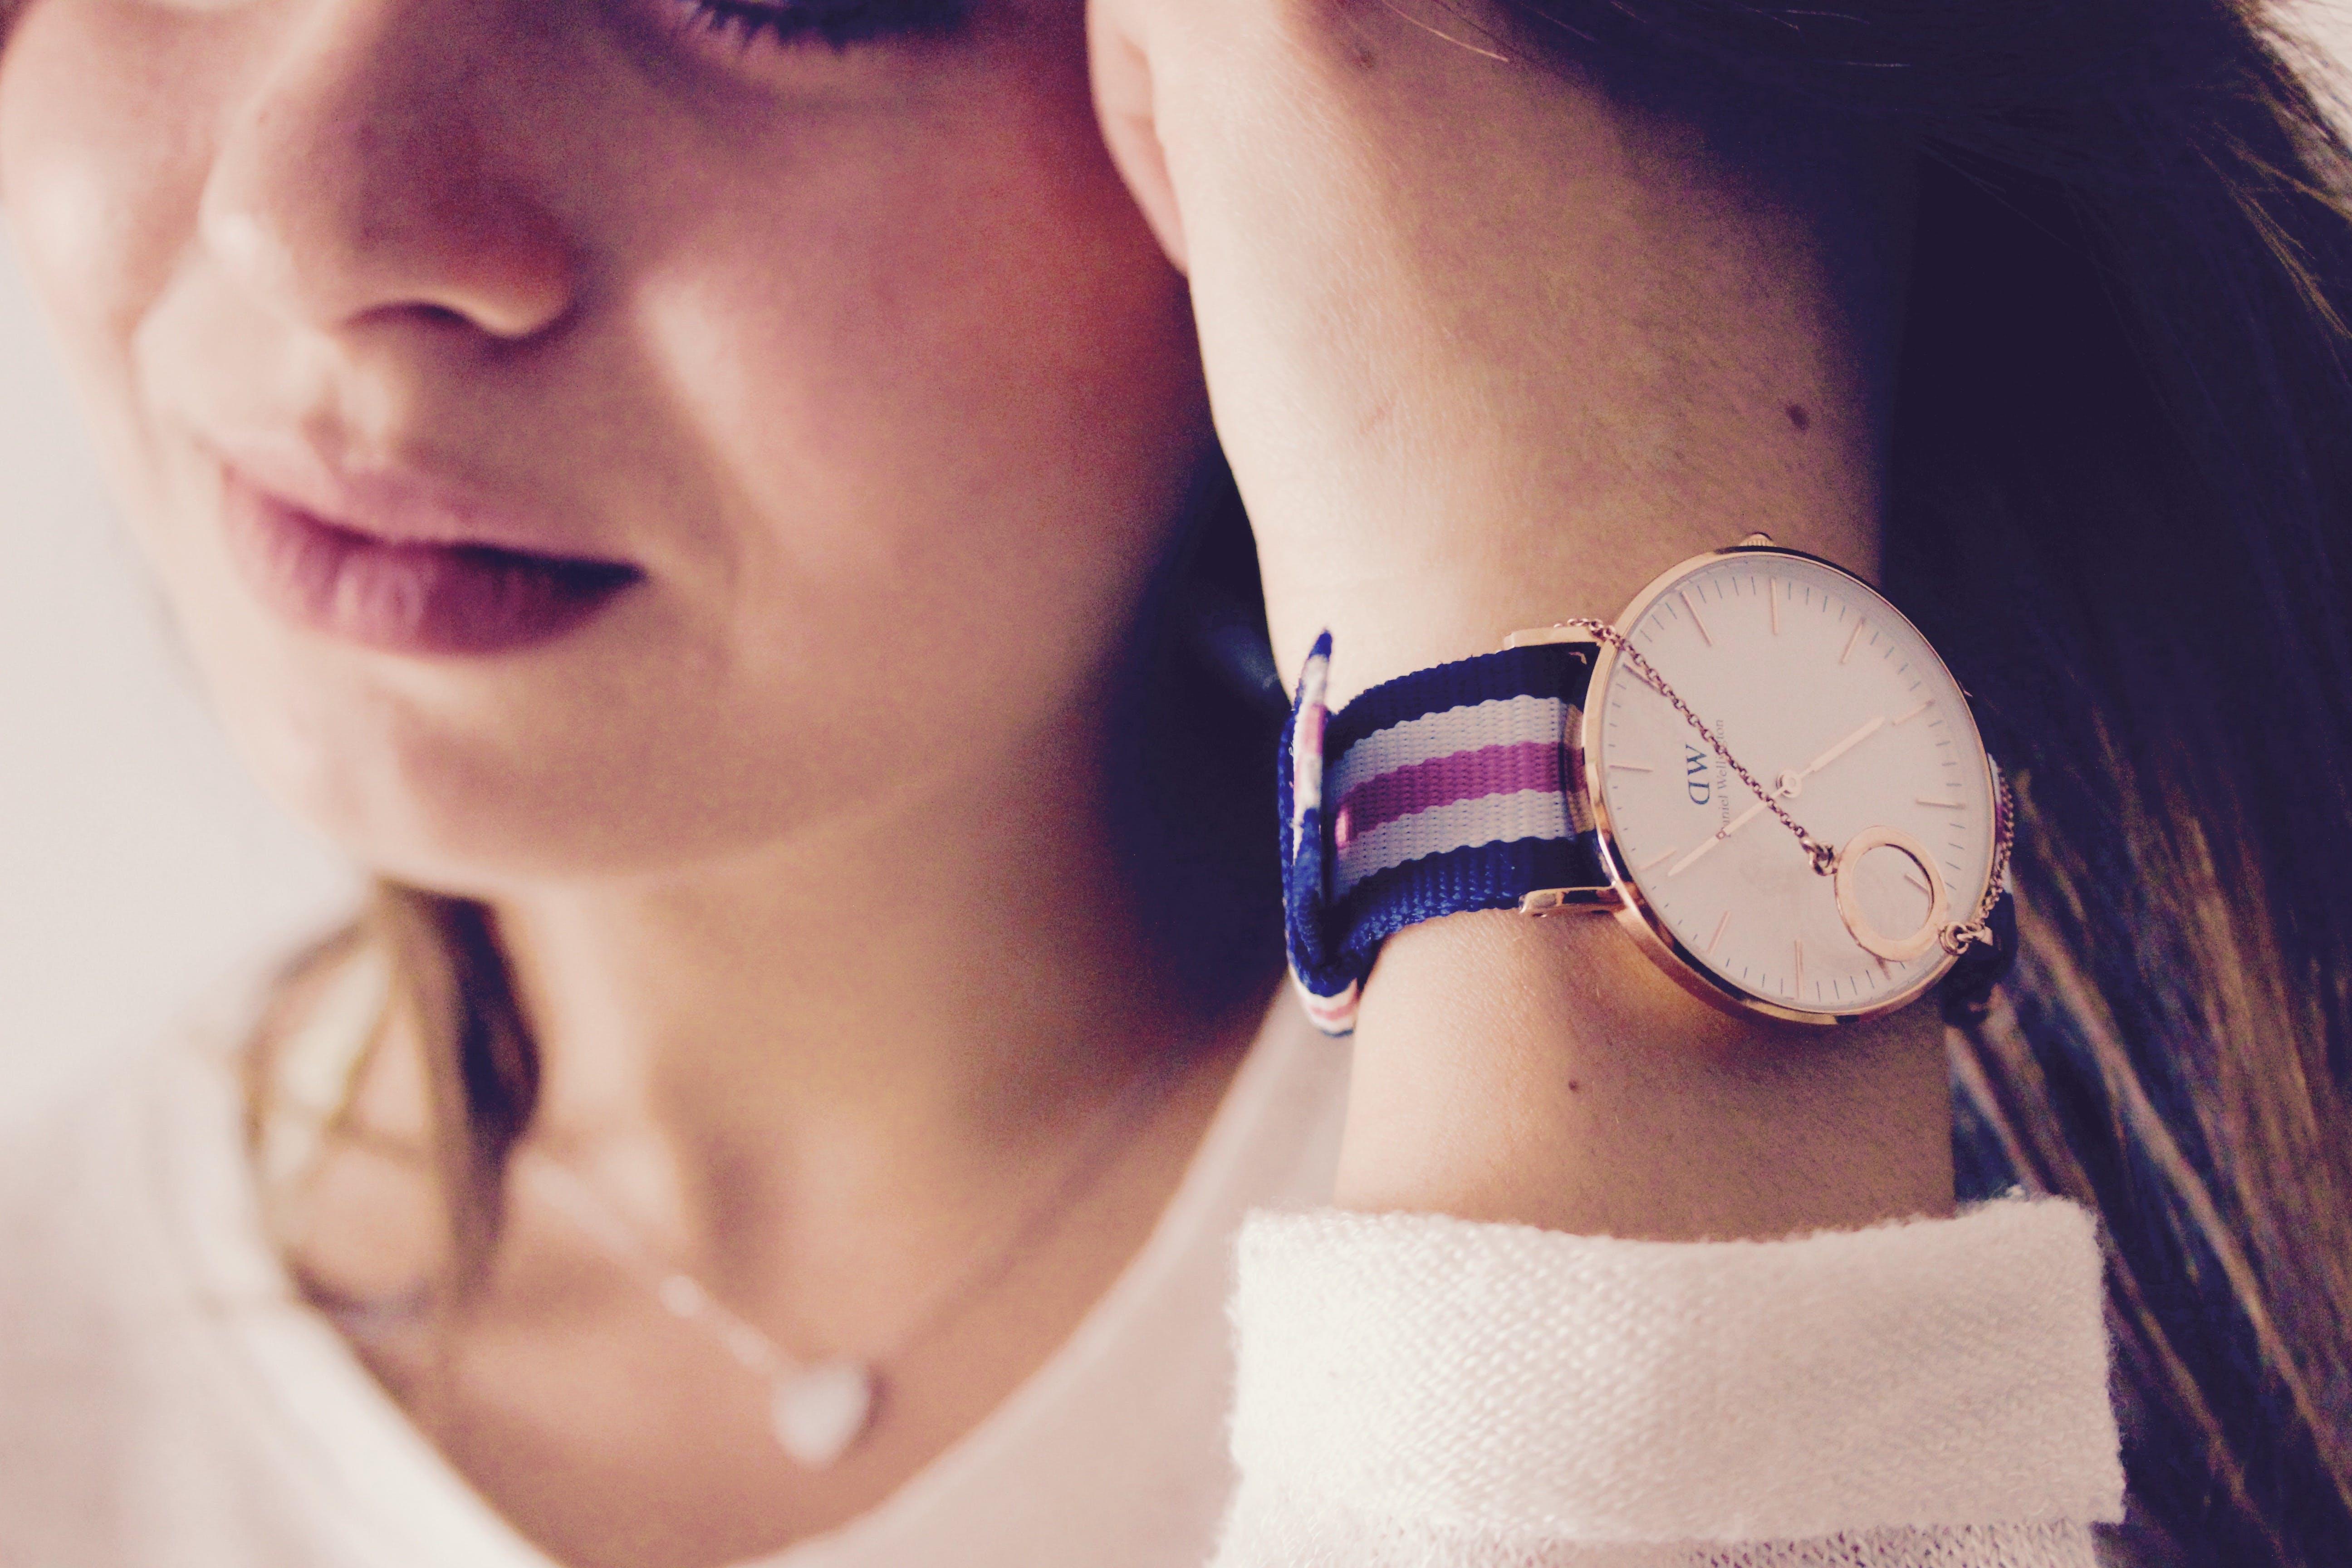 Free stock photo of fashion, person, woman, wristwatch